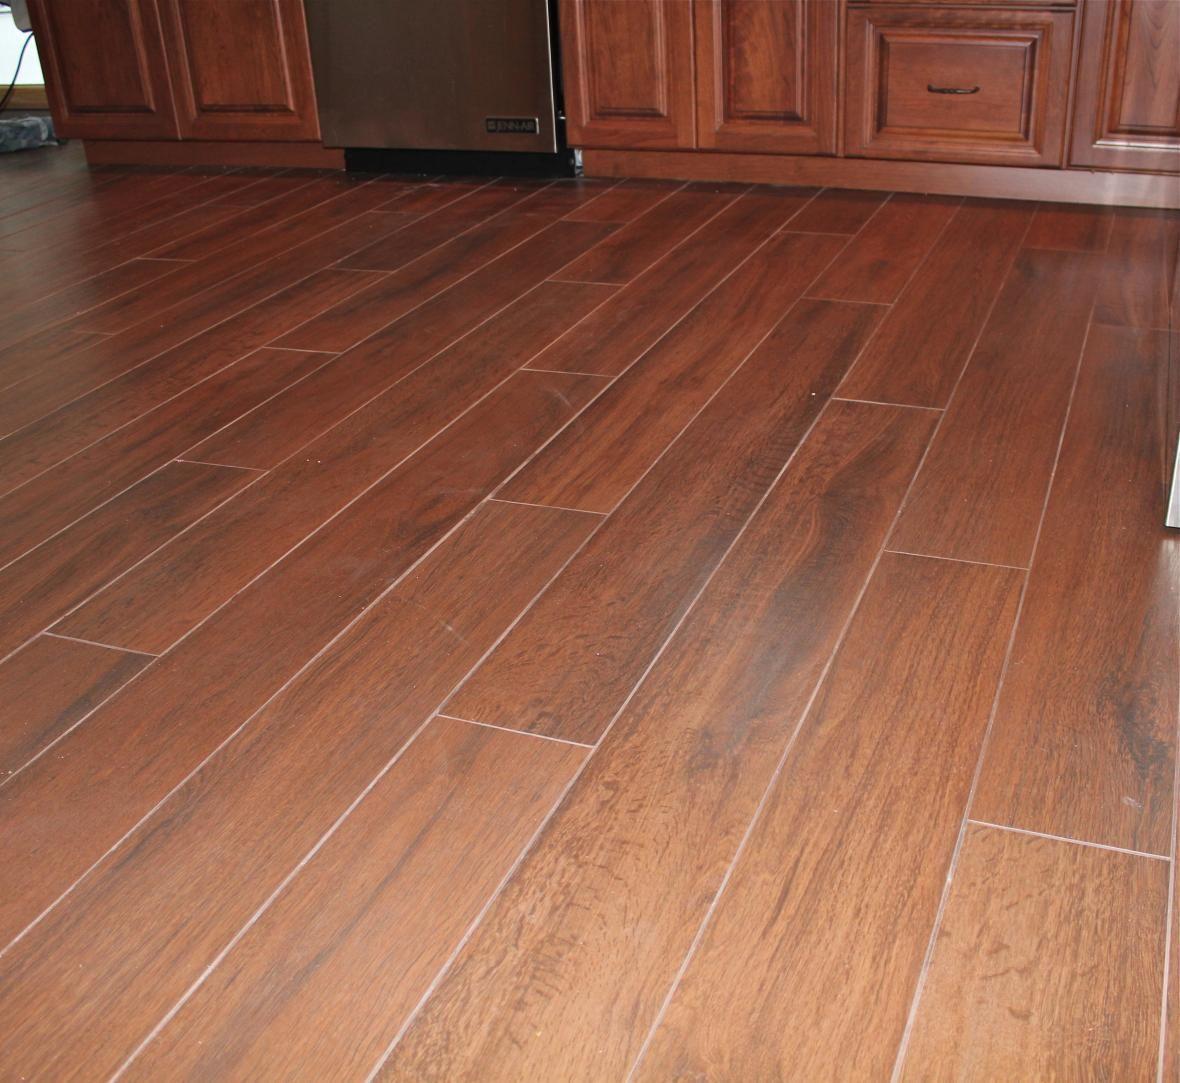 Kitchen Ceramic Floor Tiles Kitchen Floor Tiles Ideas Photo Of Brown Odd Shapes Kitchen With